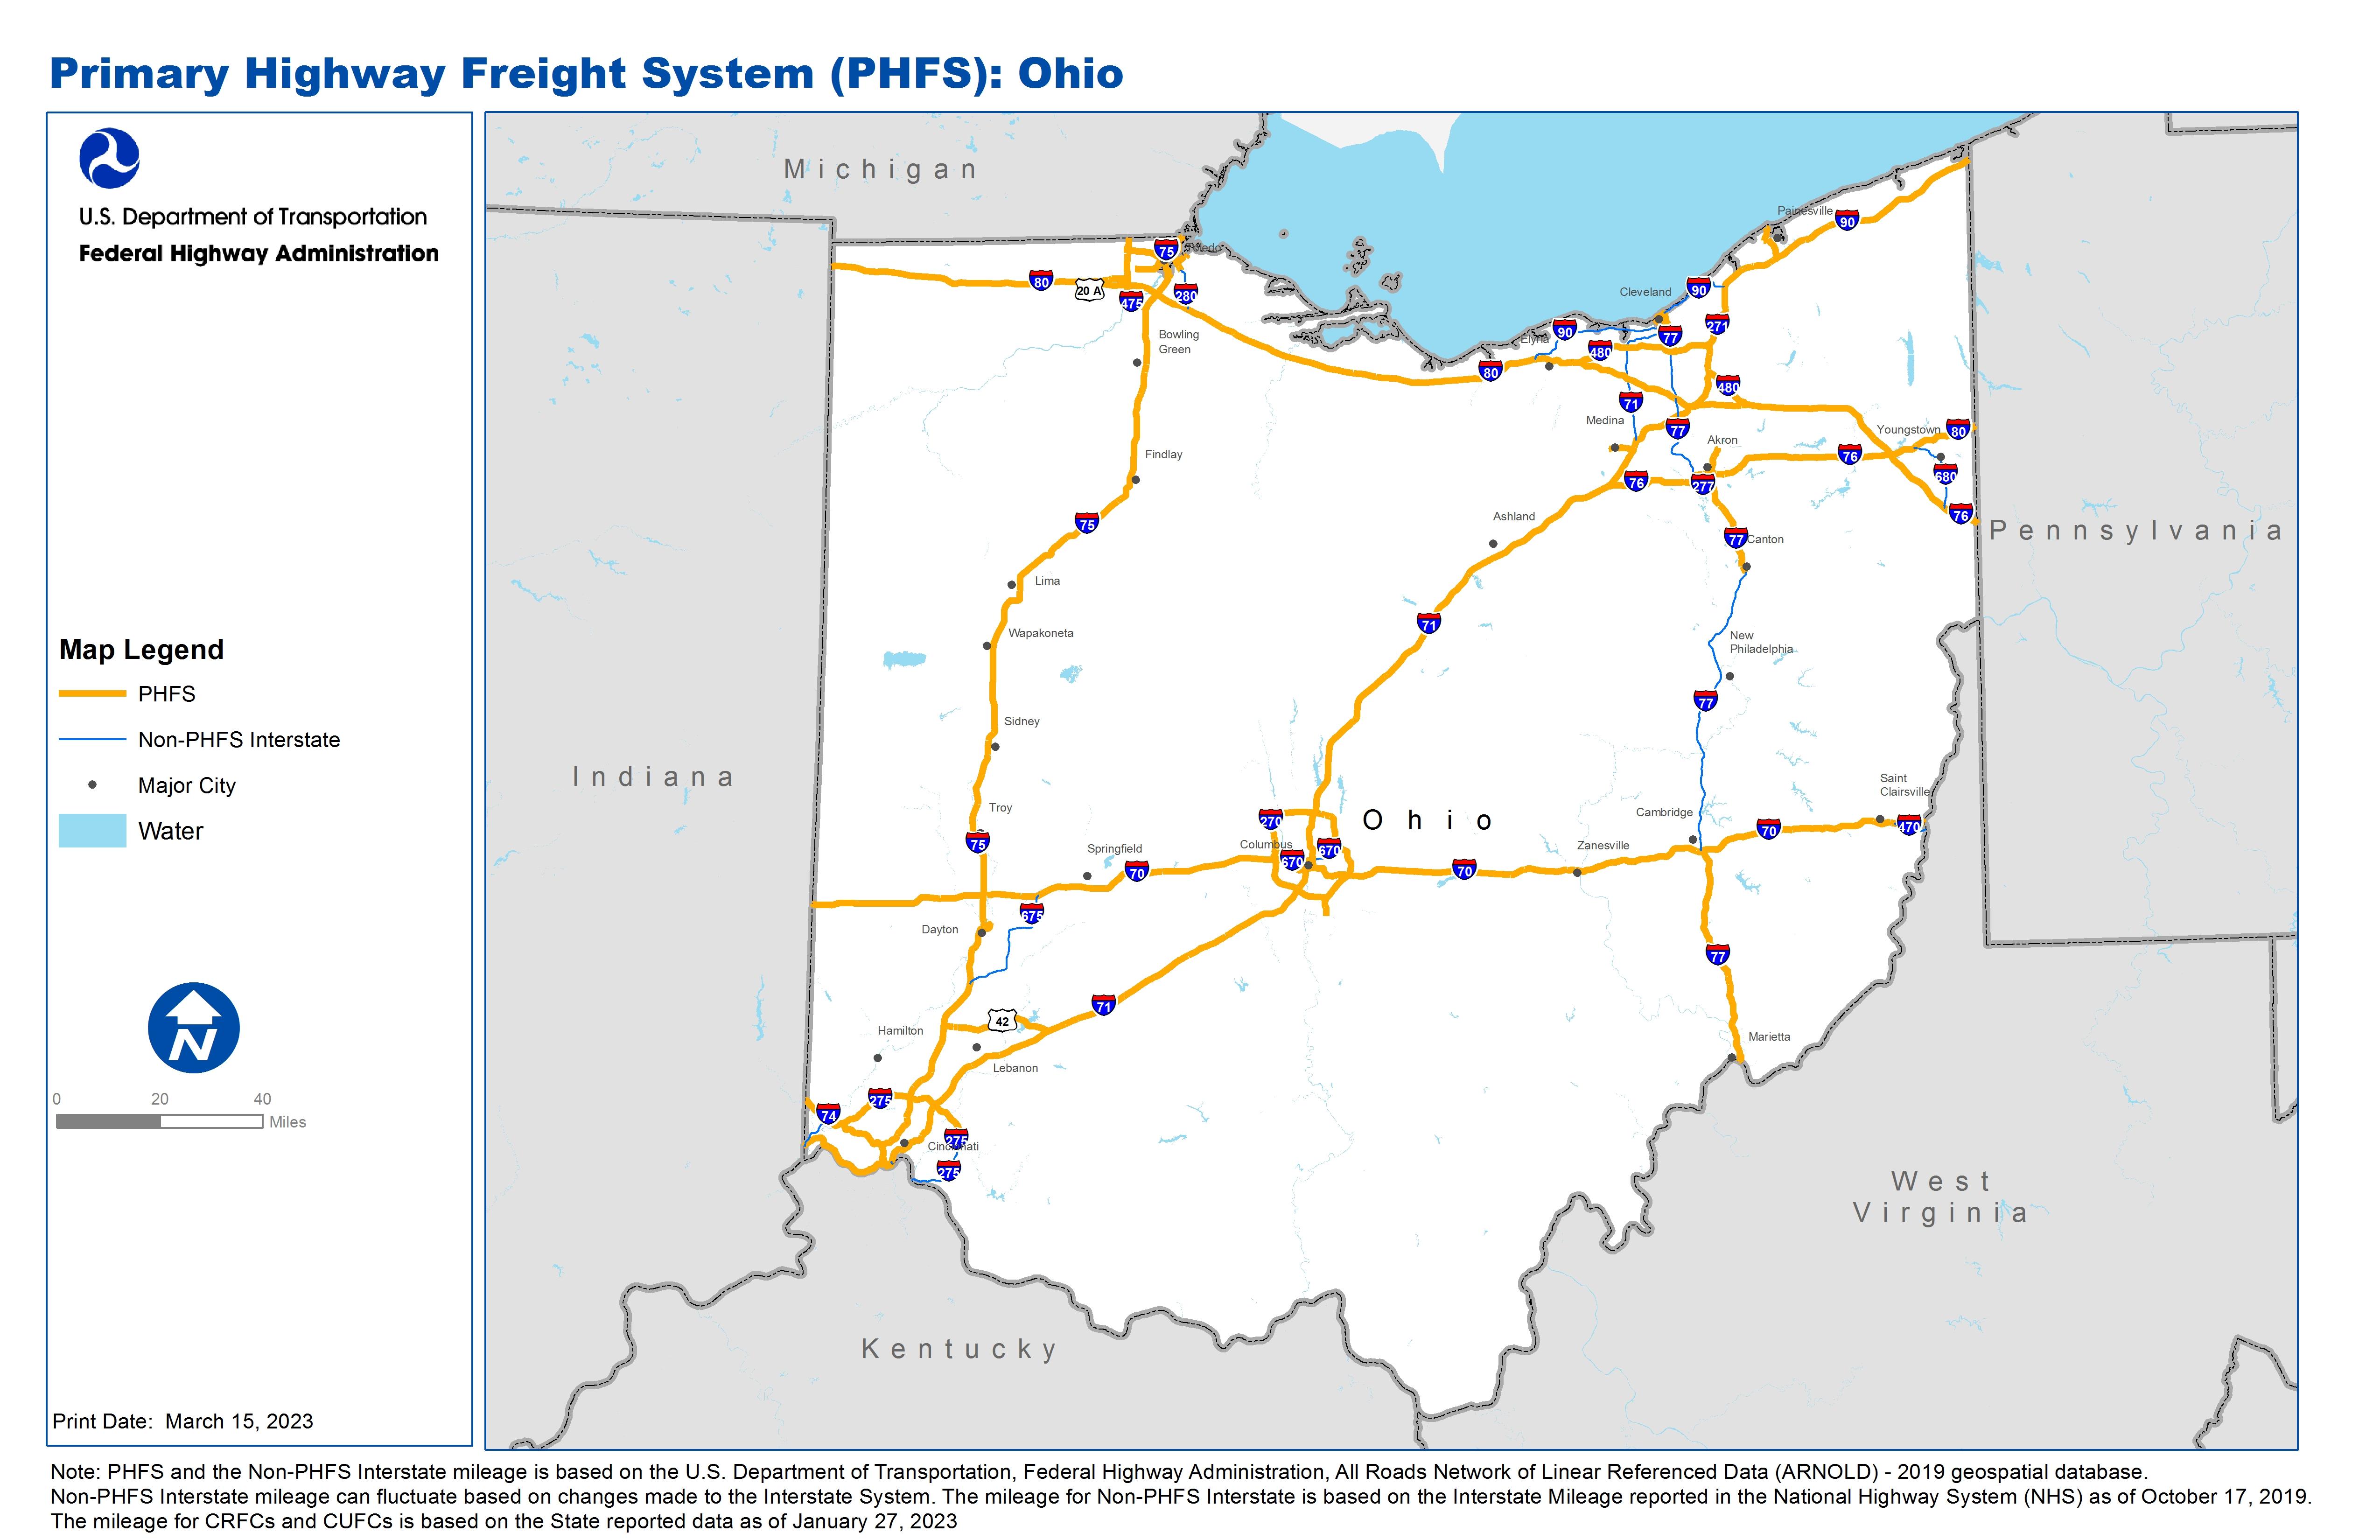 National Highway Freight Network Map and Tables for Ohio ... on map of illinois, oberlin ohio, map of michigan, map of italy, logan ohio, map of georgia, kent ohio, maumee ohio, list cities ohio, map of virginia, grove city ohio, youngstown ohio, middletown ohio, map of north carolina, map of california, map of usa, cities in ohio, map of maine, map of arizona, delaware ohio, kirtland ohio, defiance ohio, map of massachusetts, map of new york, mount vernon ohio, google maps ohio, map of oklahoma, wooster ohio, map of china, medina ohio, marion ohio, map of alaska, map of new jersey, map of texas, map of delaware, map of mexico, counties in ohio, solon ohio, wapakoneta ohio,